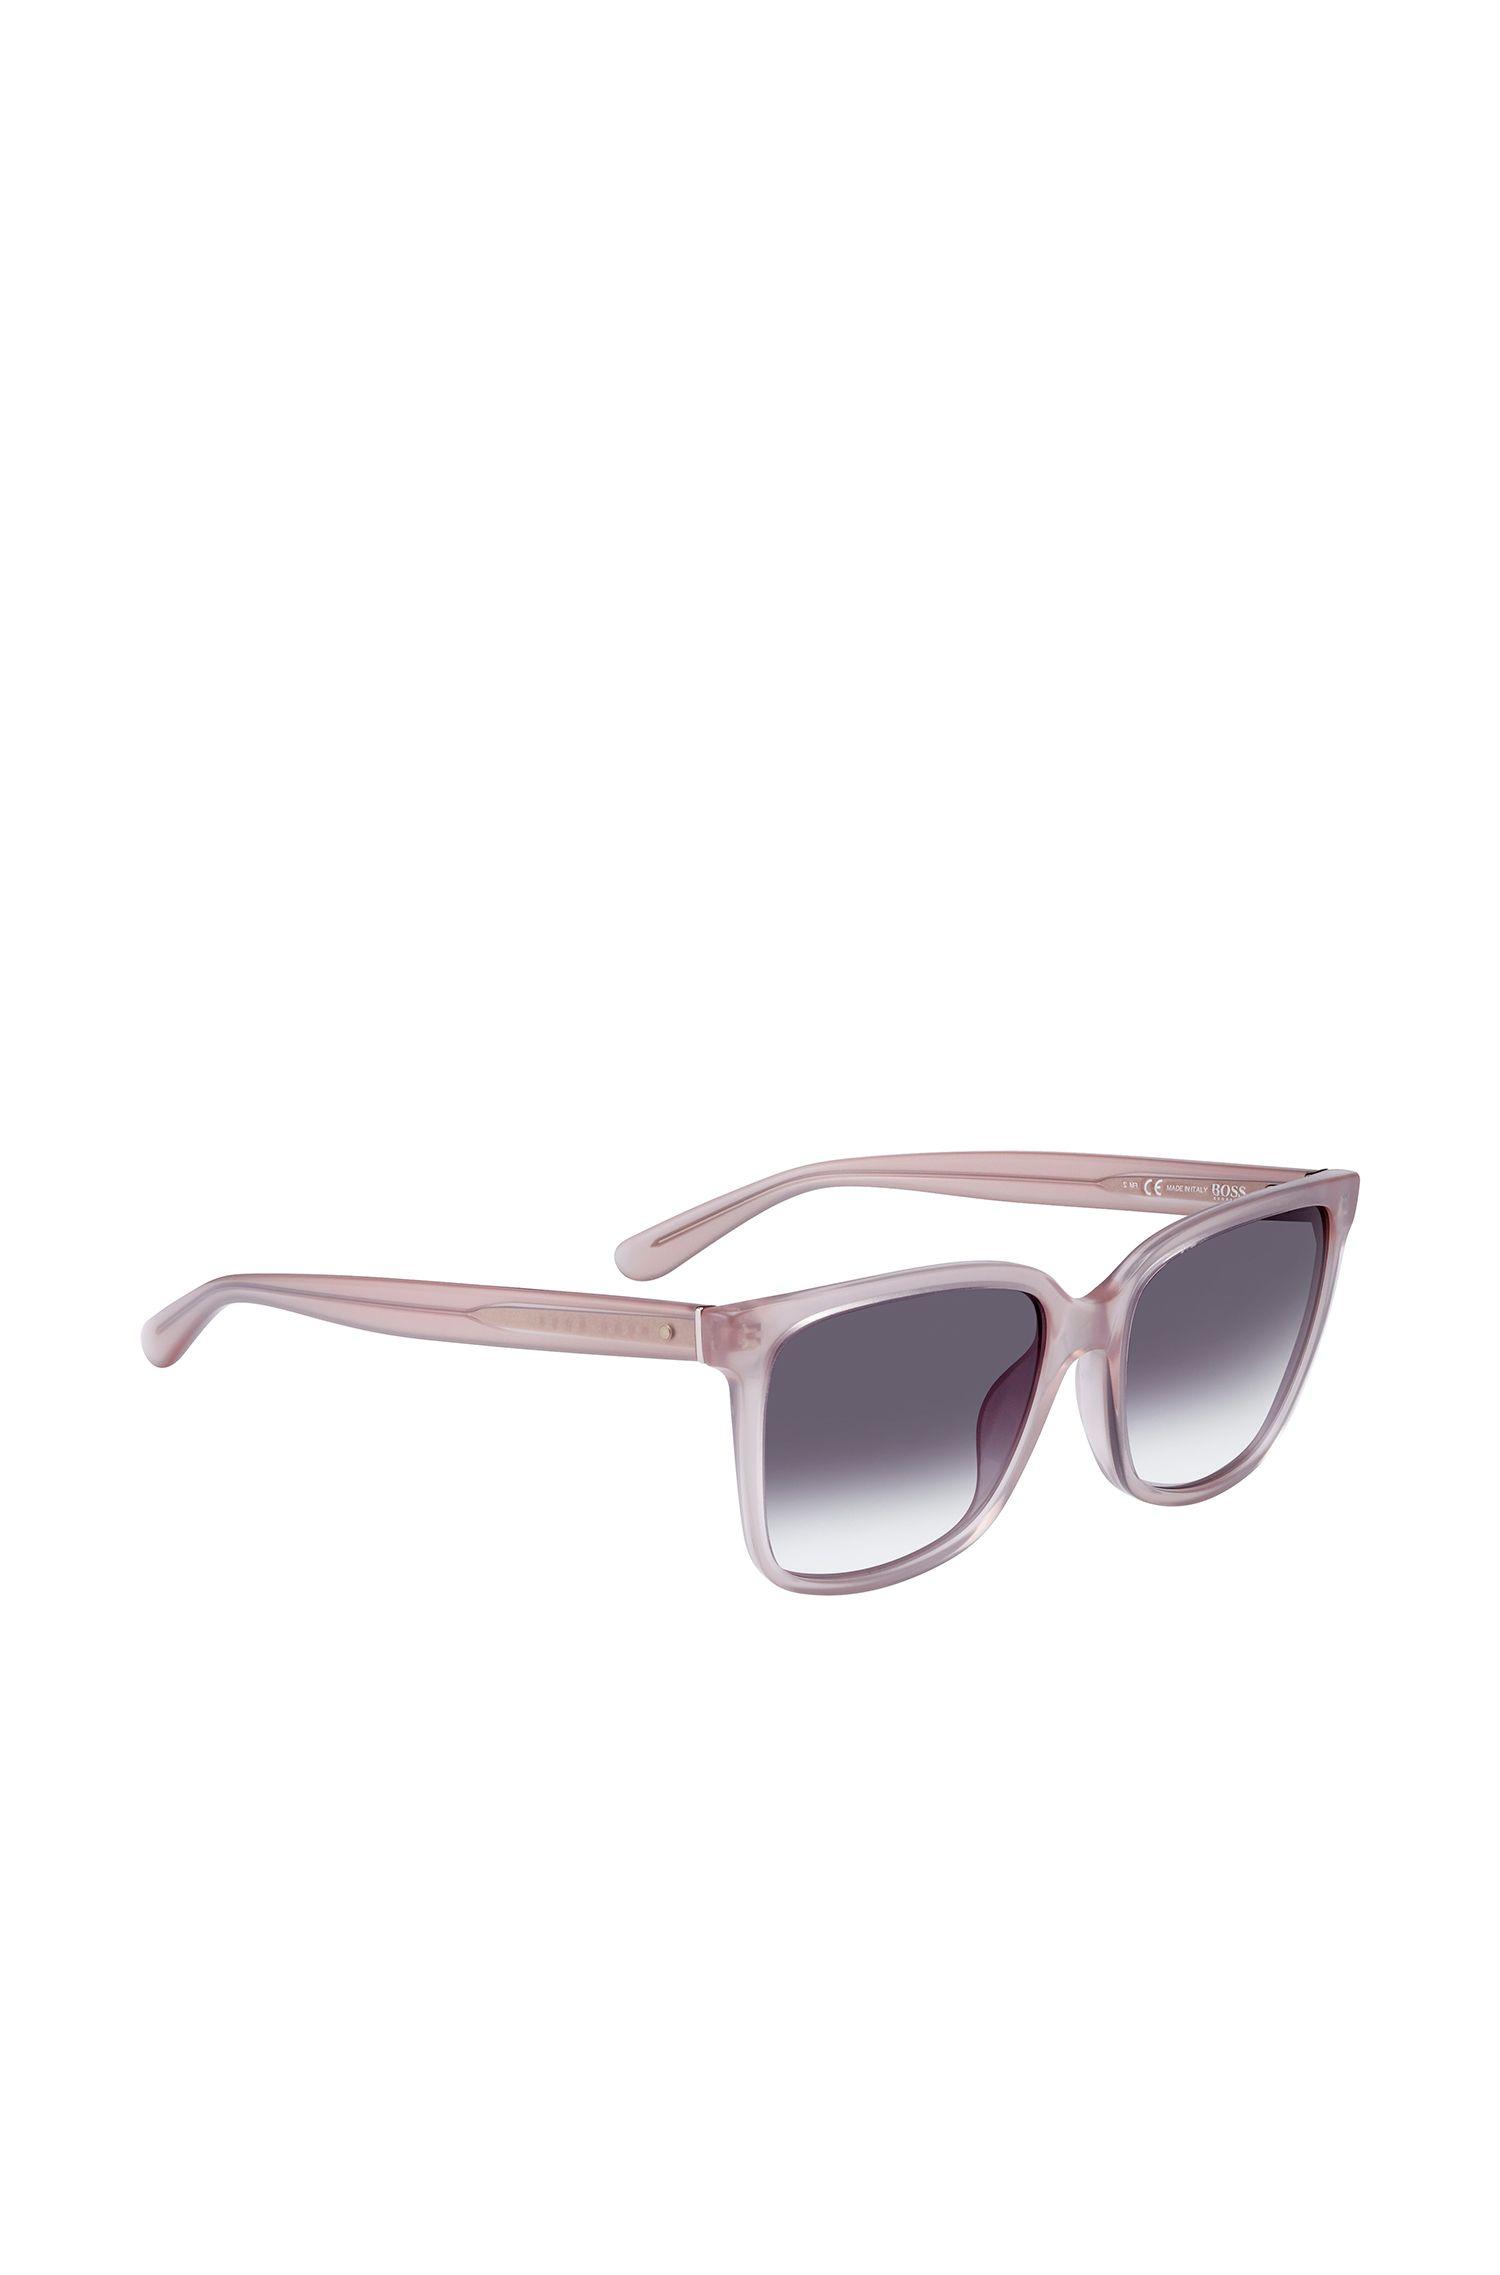 Gray Gradient Lens Square Sunglasses | BOSS 0787S